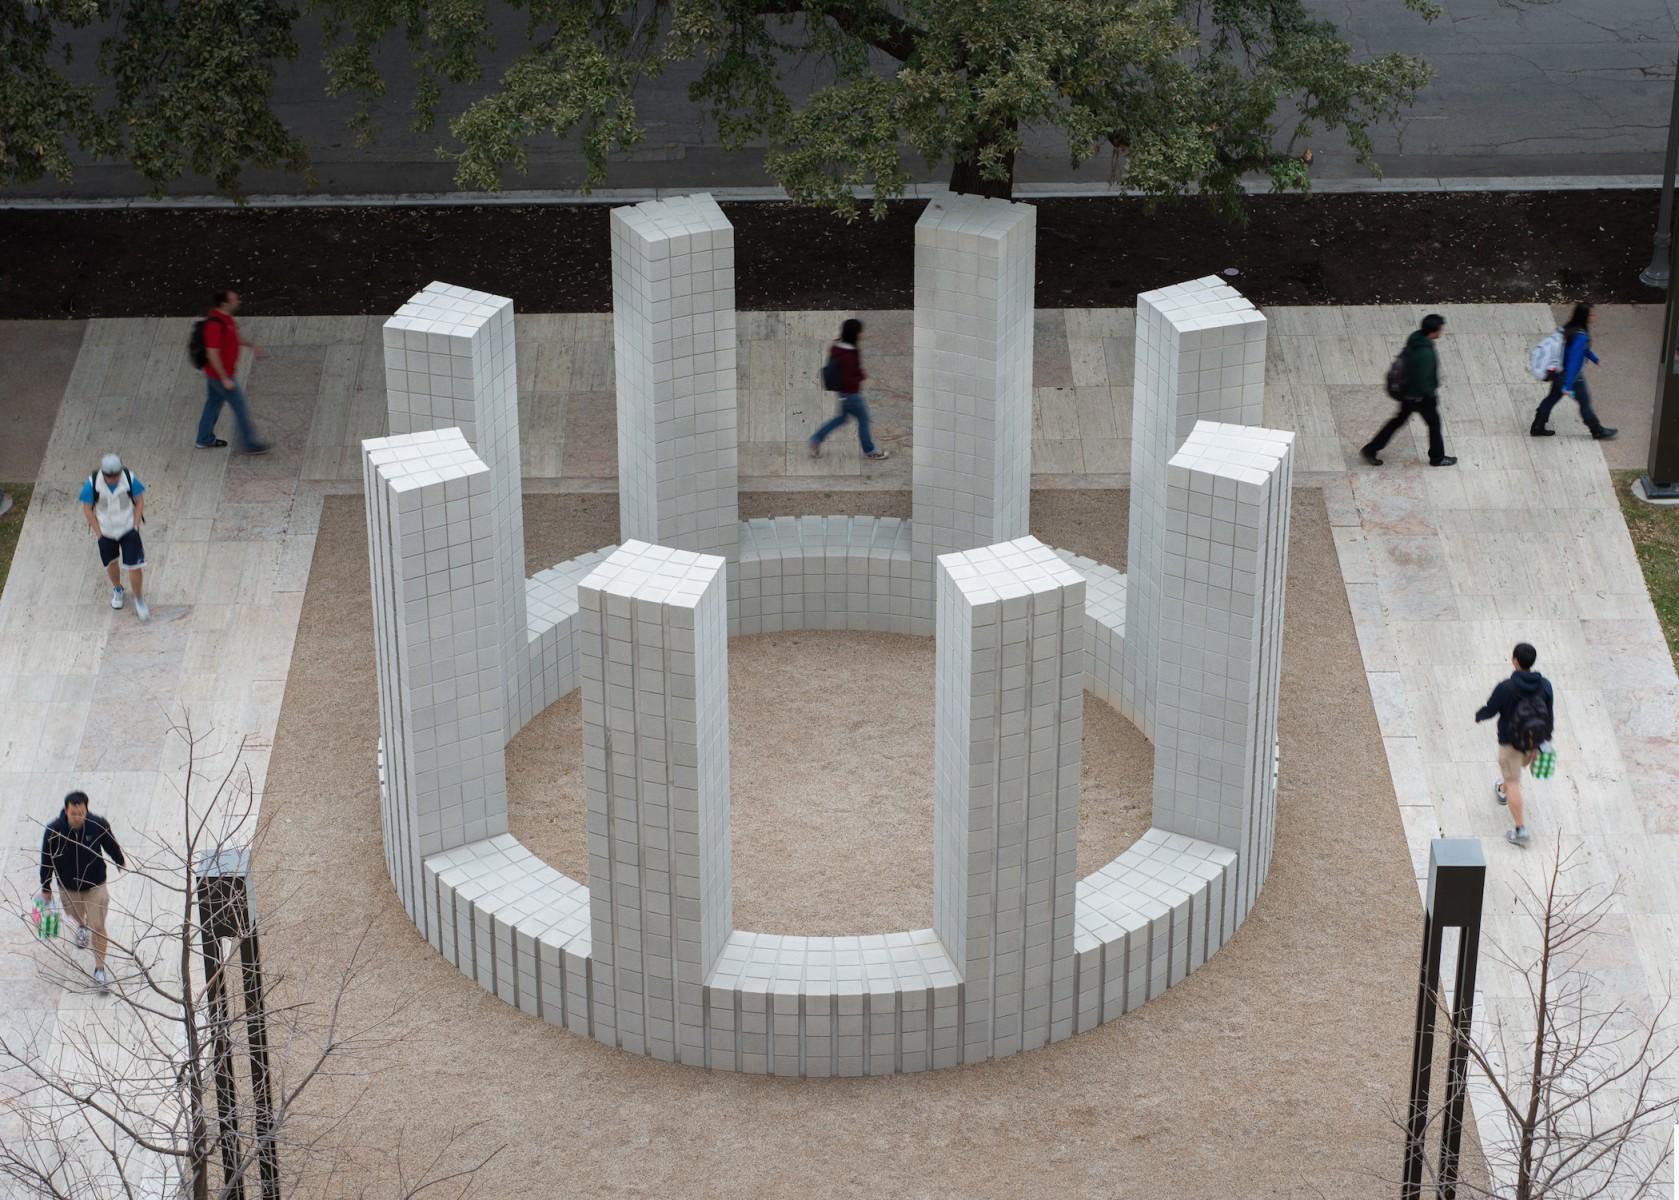 A circular symmetrical concrete structure